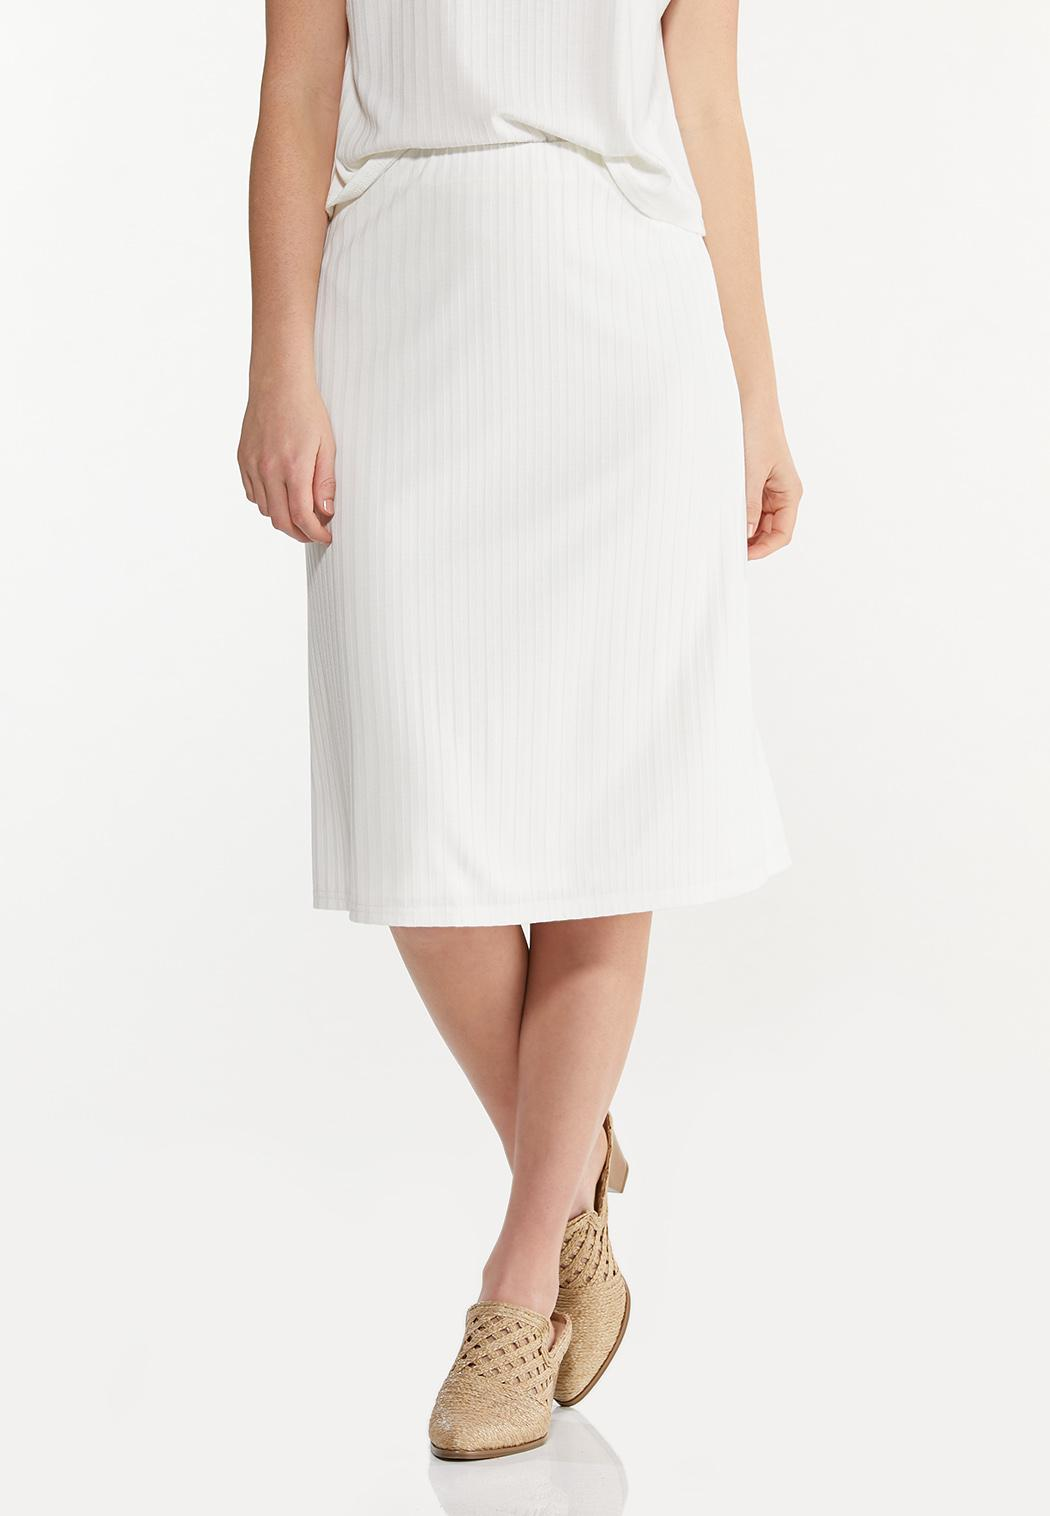 Plus Size Ivory Ribbed Skirt